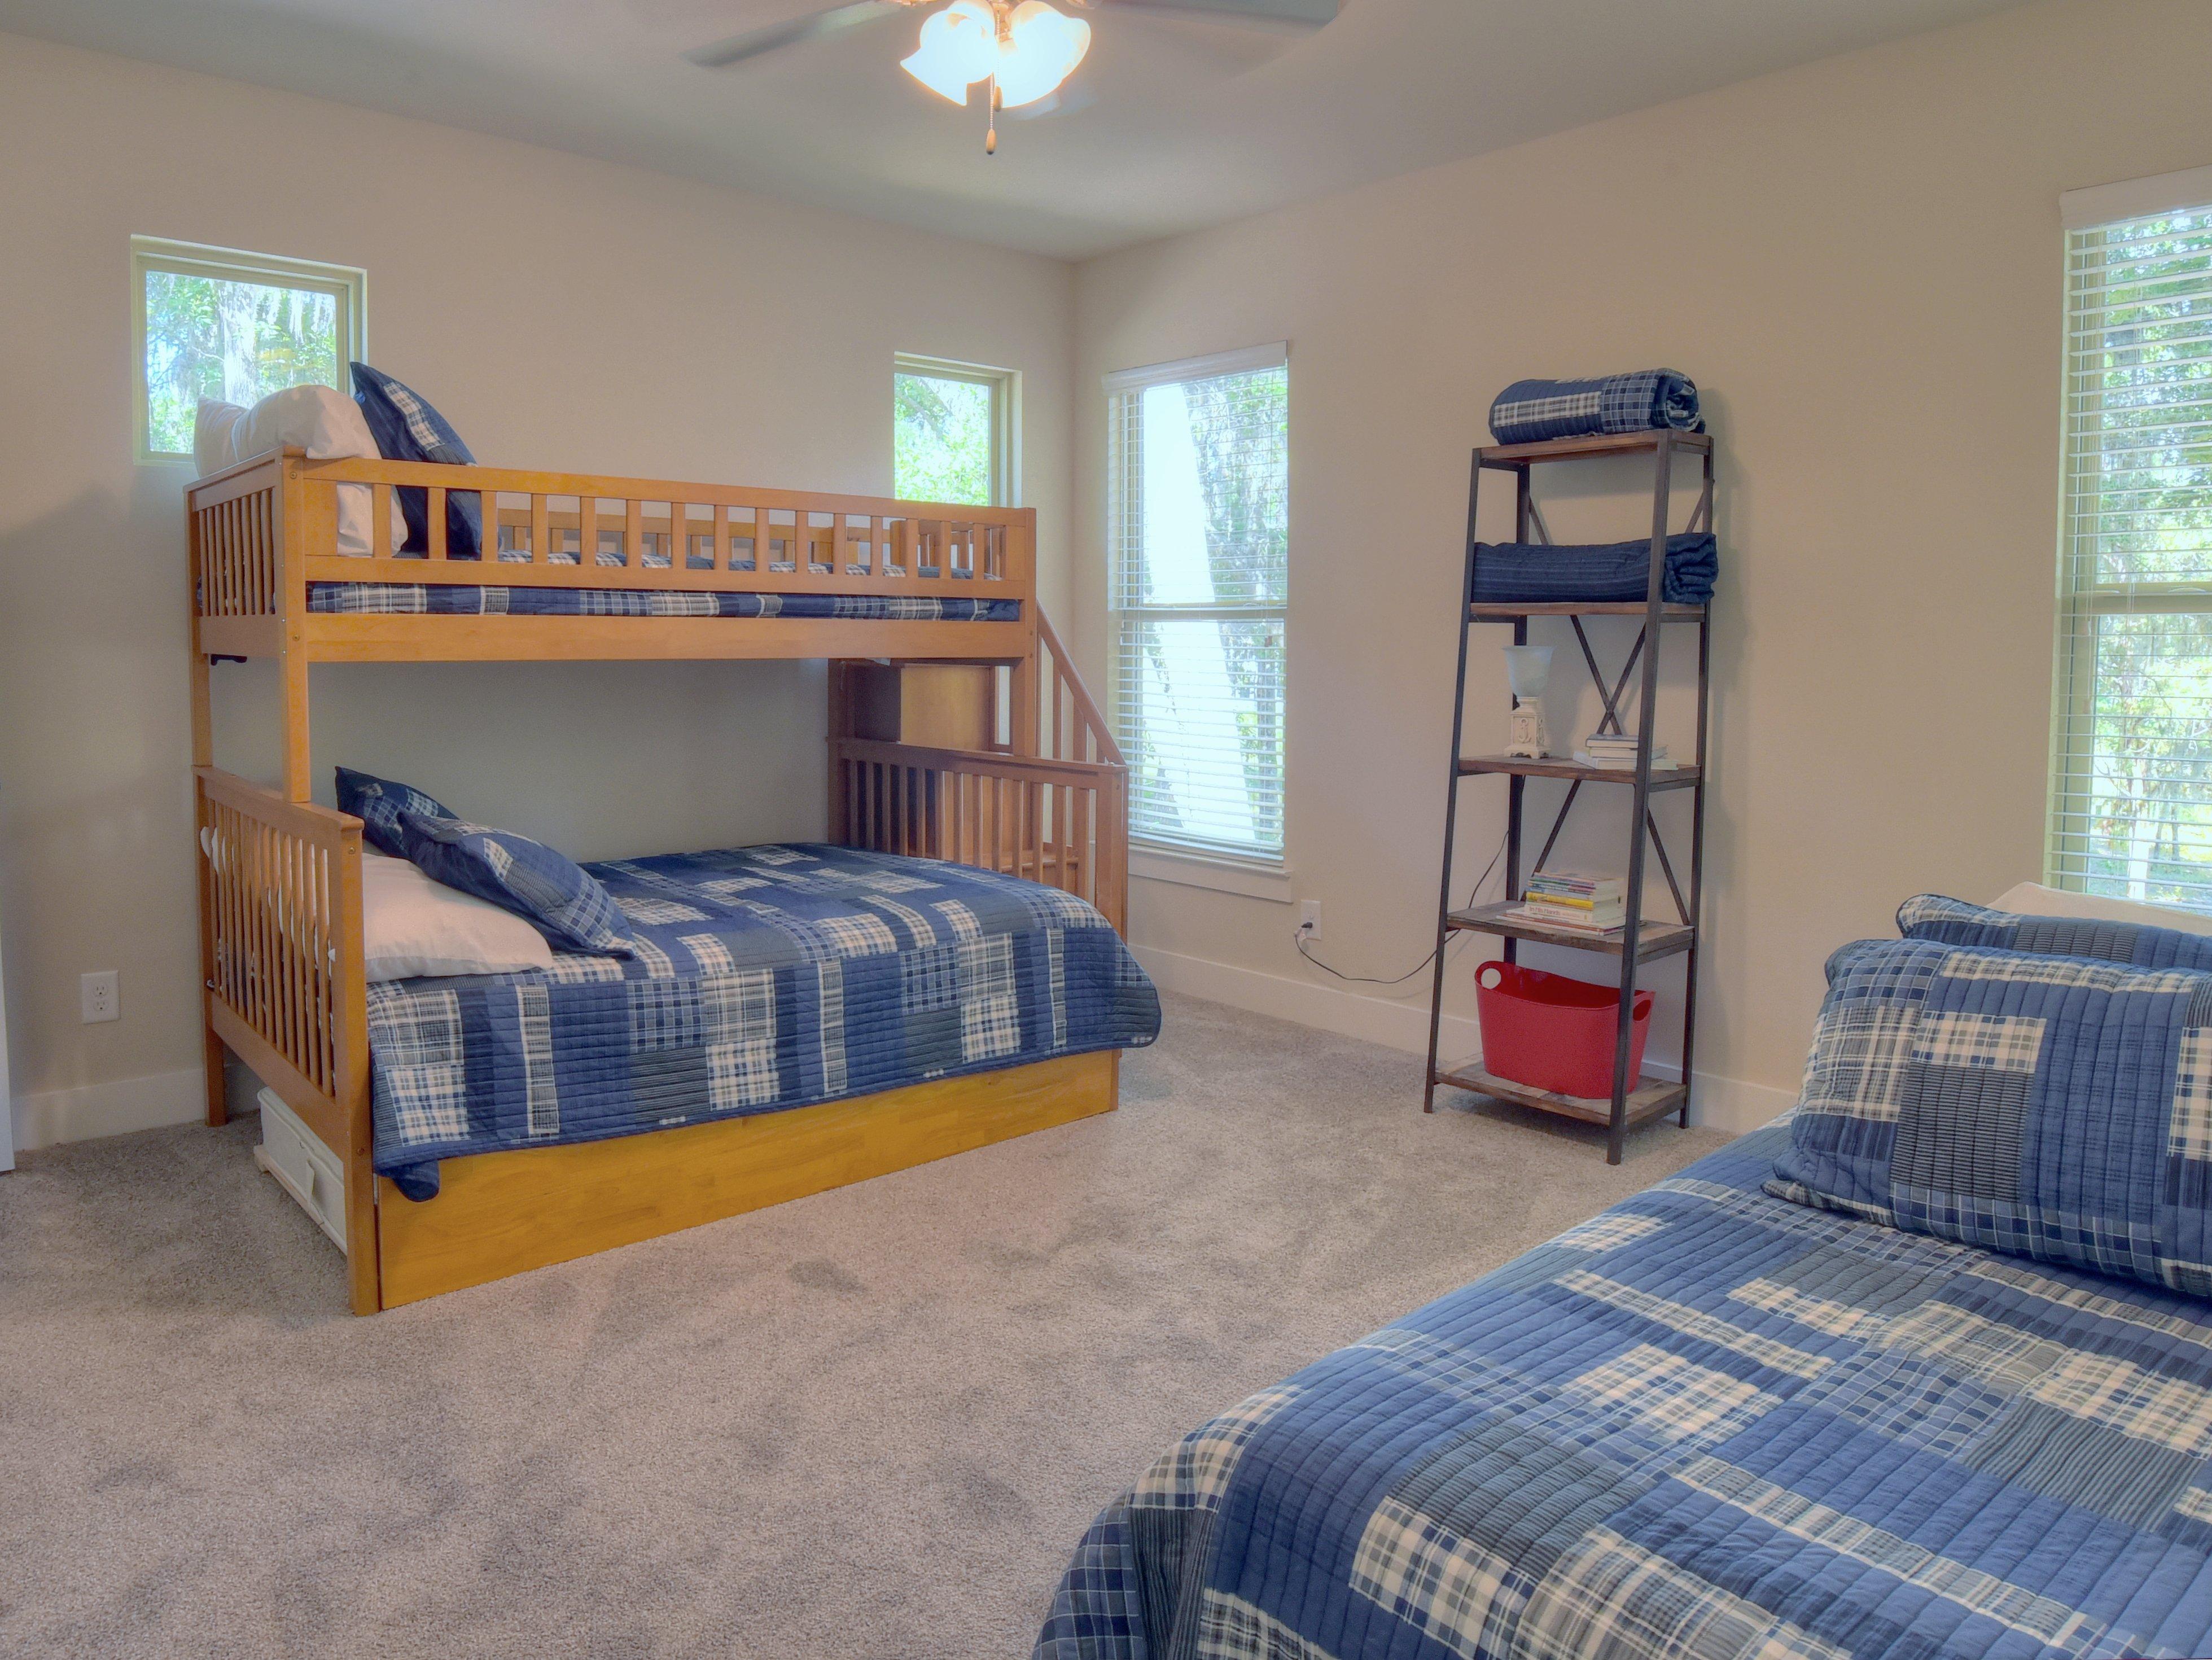 93 Beacon Point Condo rental in Sandestin Rentals ~ Cottages and Villas  in Destin Florida - #18